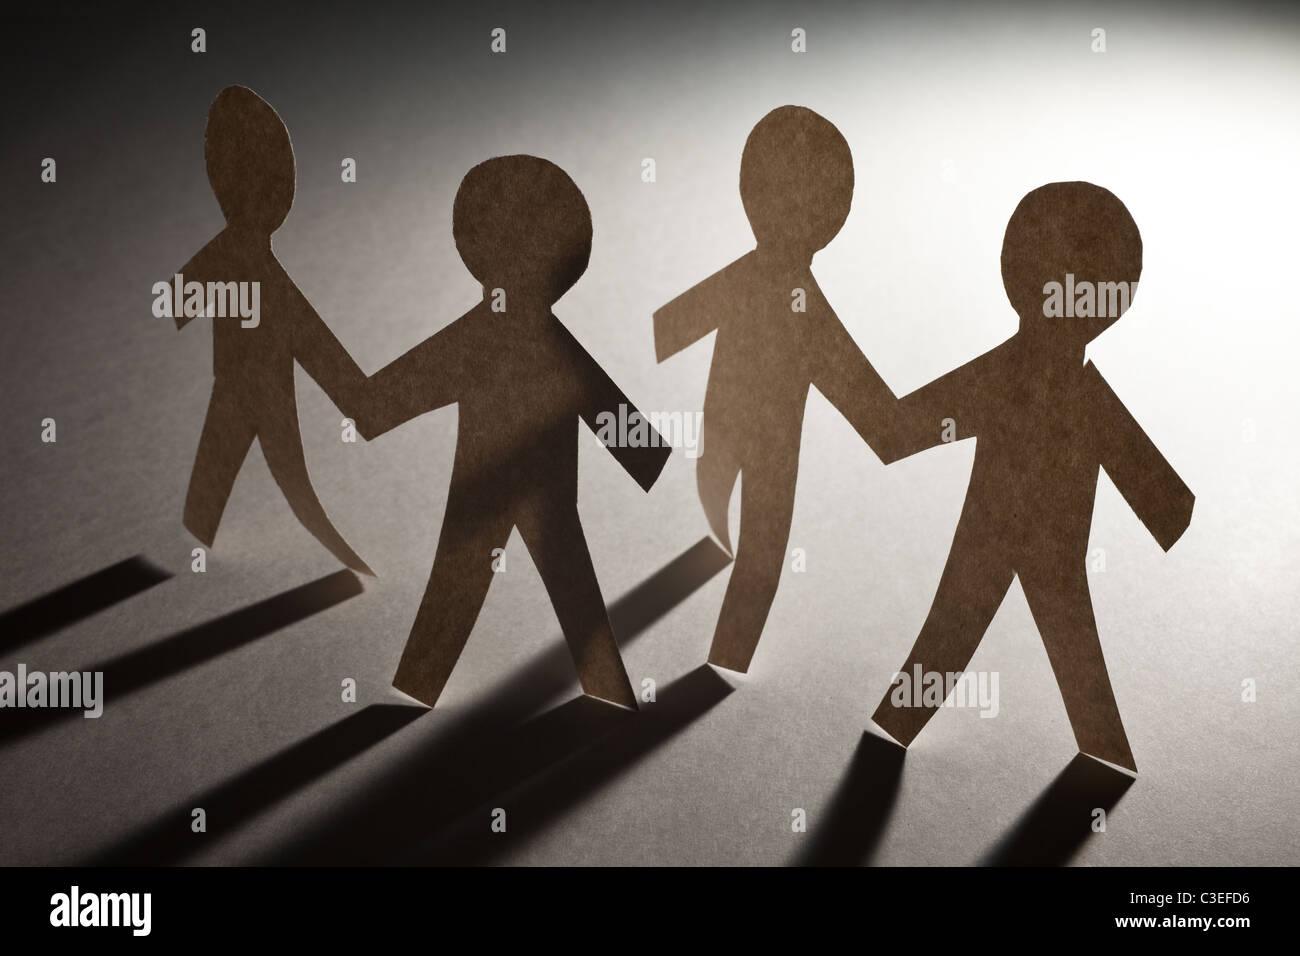 Paper Chain Men, concept of Teamwork - Stock Image